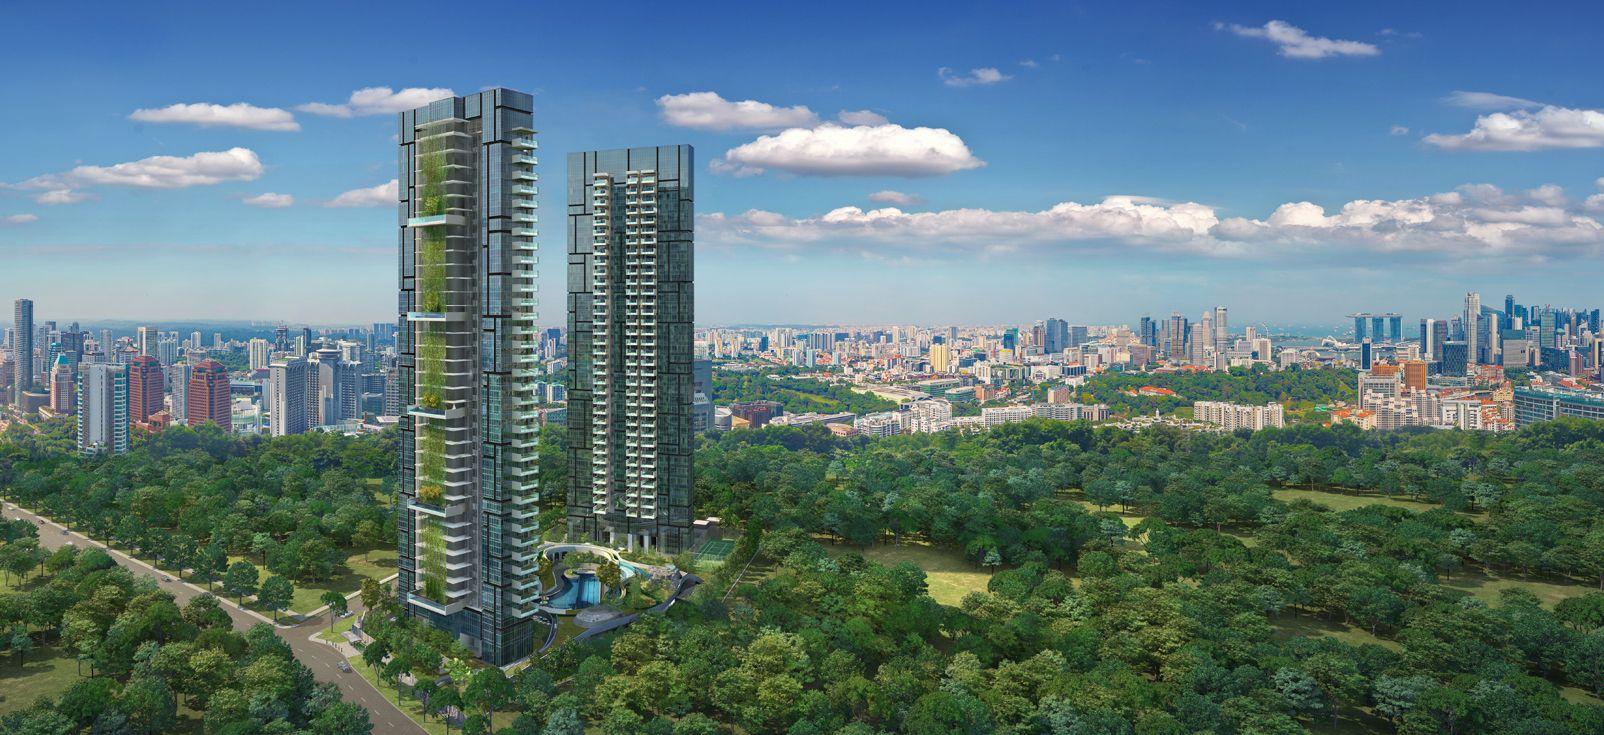 8 St Thomas Property   SG Luxury Condo for Sale